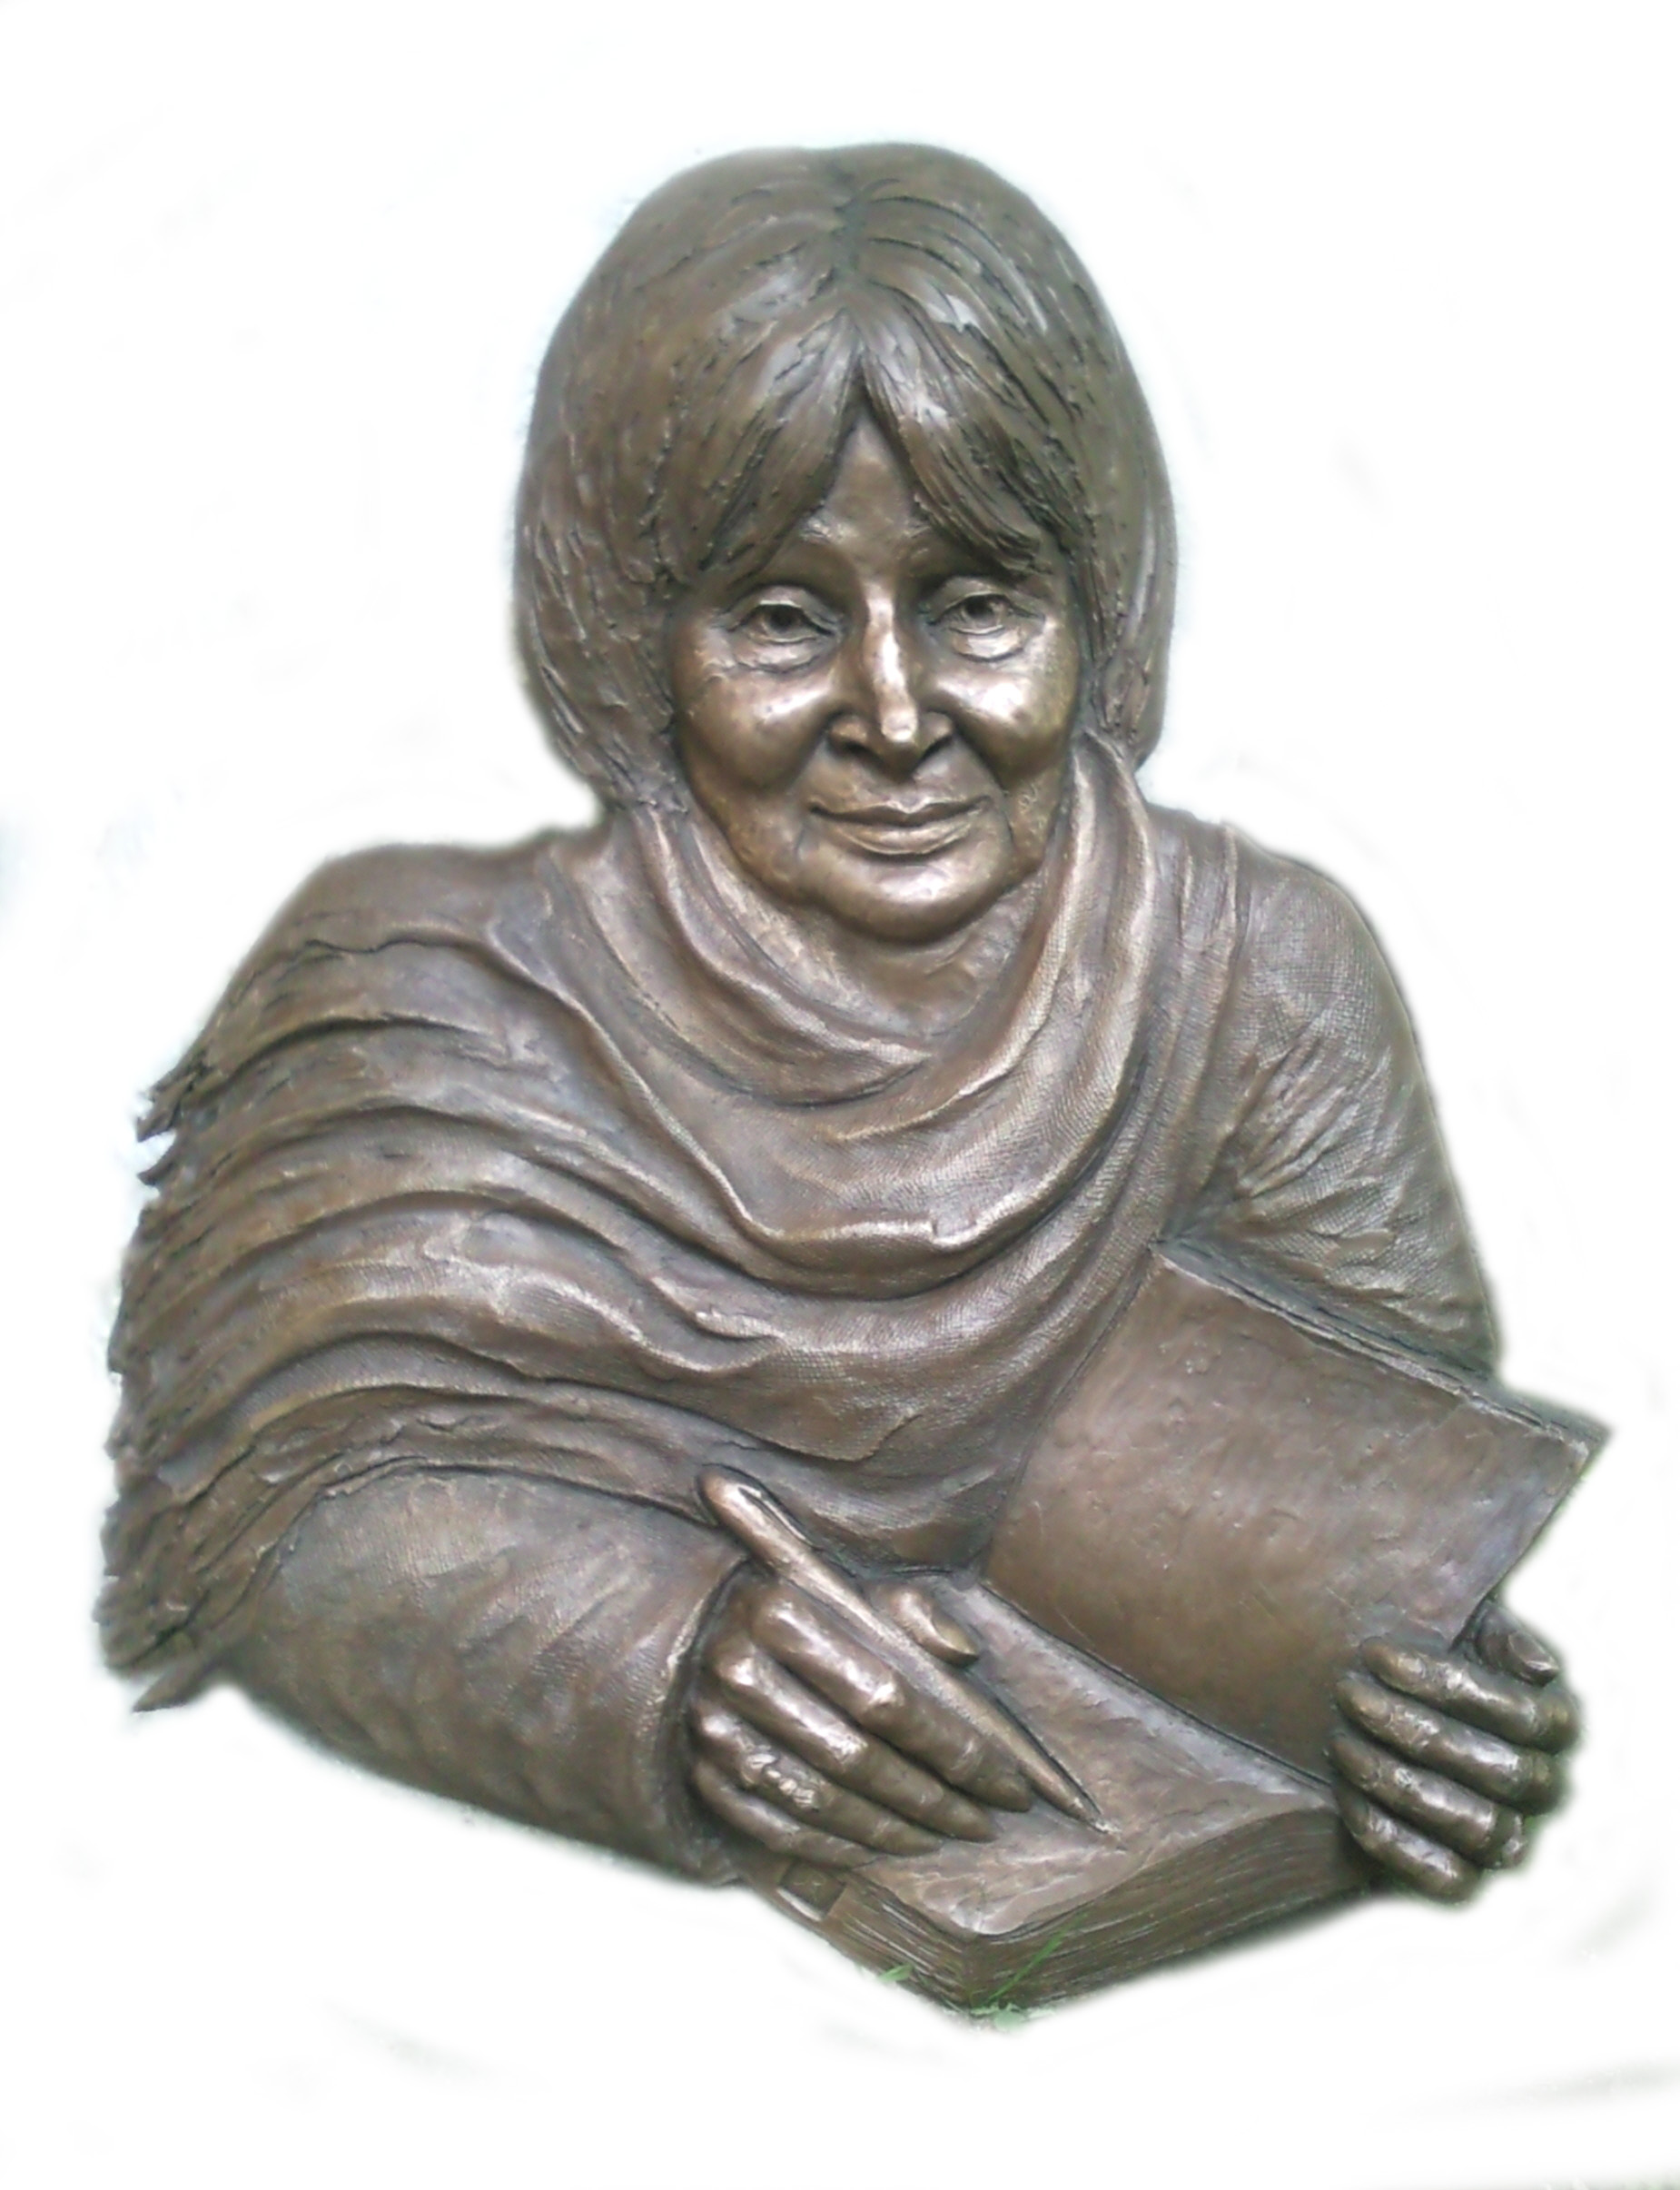 File:Szabó Magda bronz dombormű.jpg - Wikimedia Commons